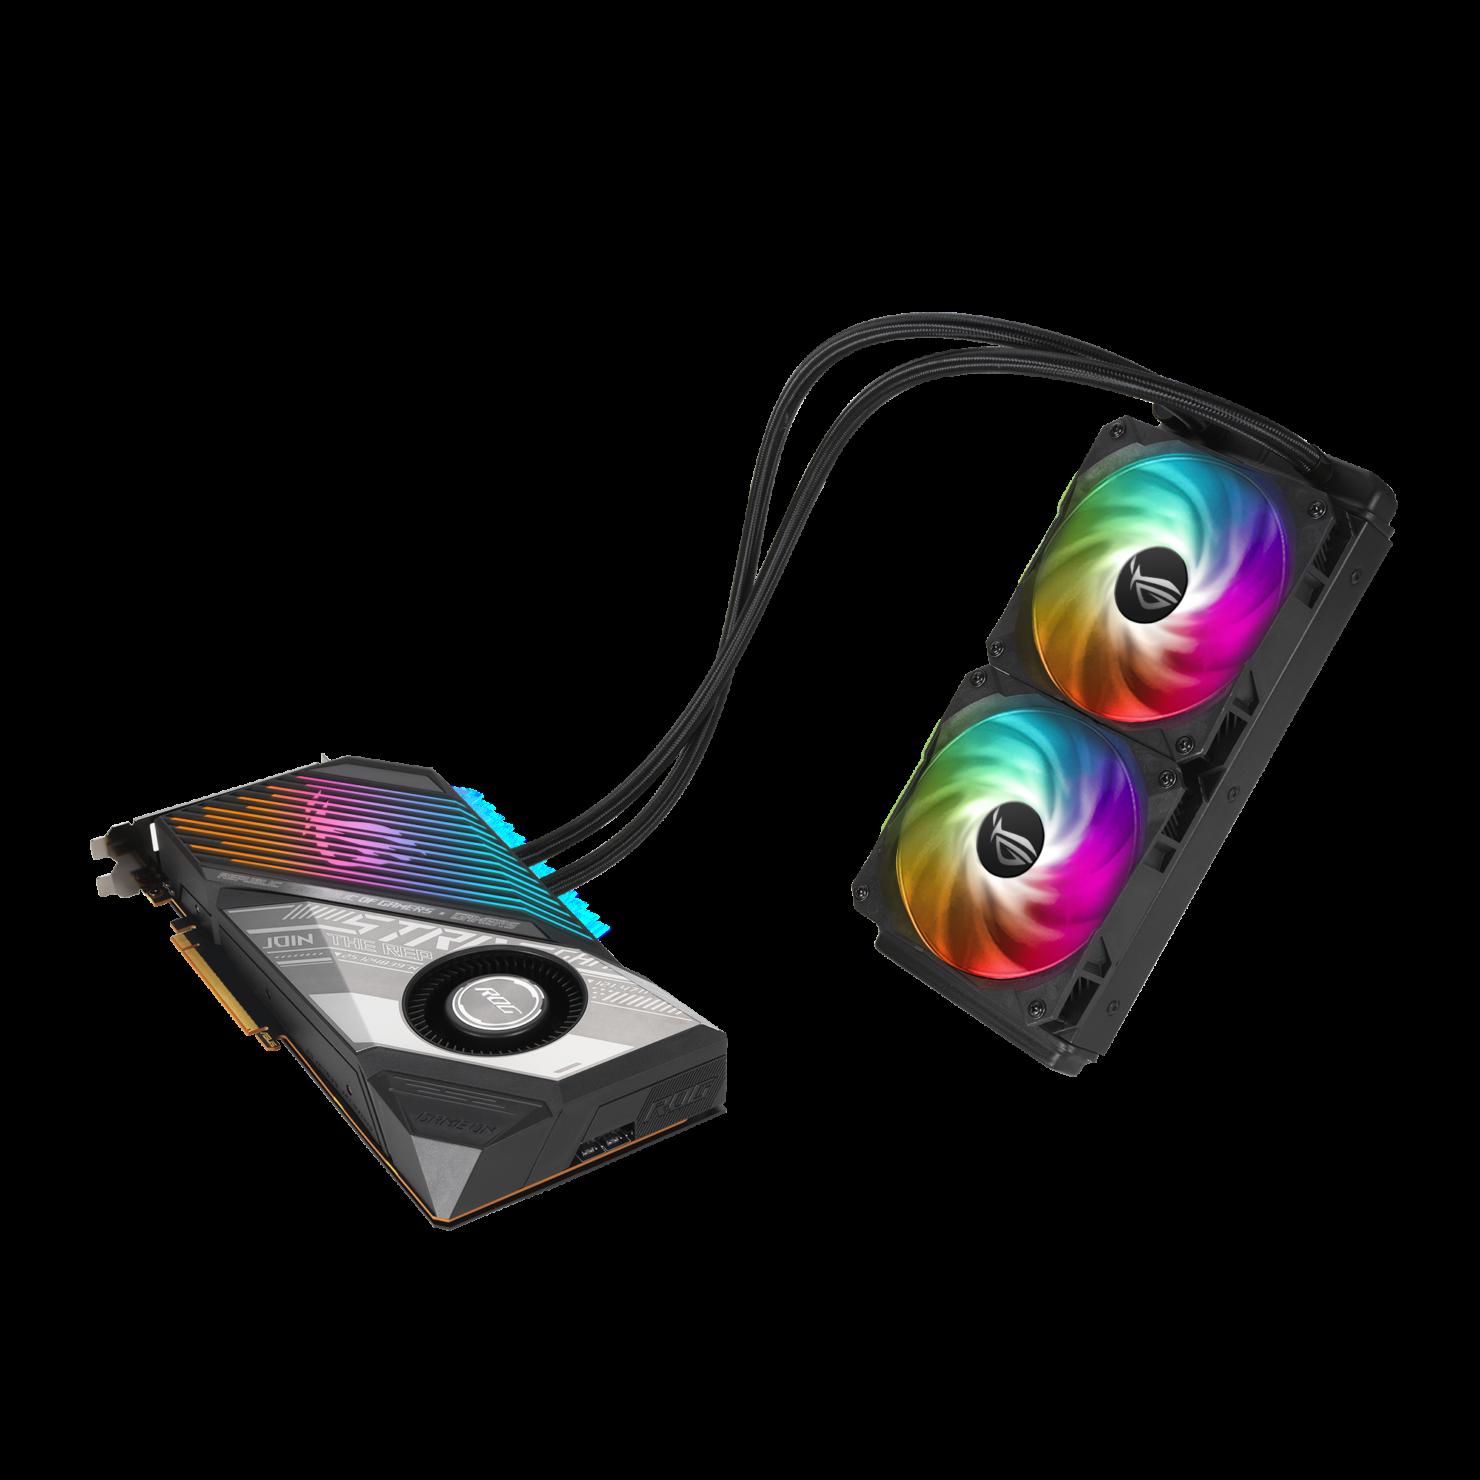 asus-radeon-rx-6800-xt-rog-strix-lc-graphics-card_5